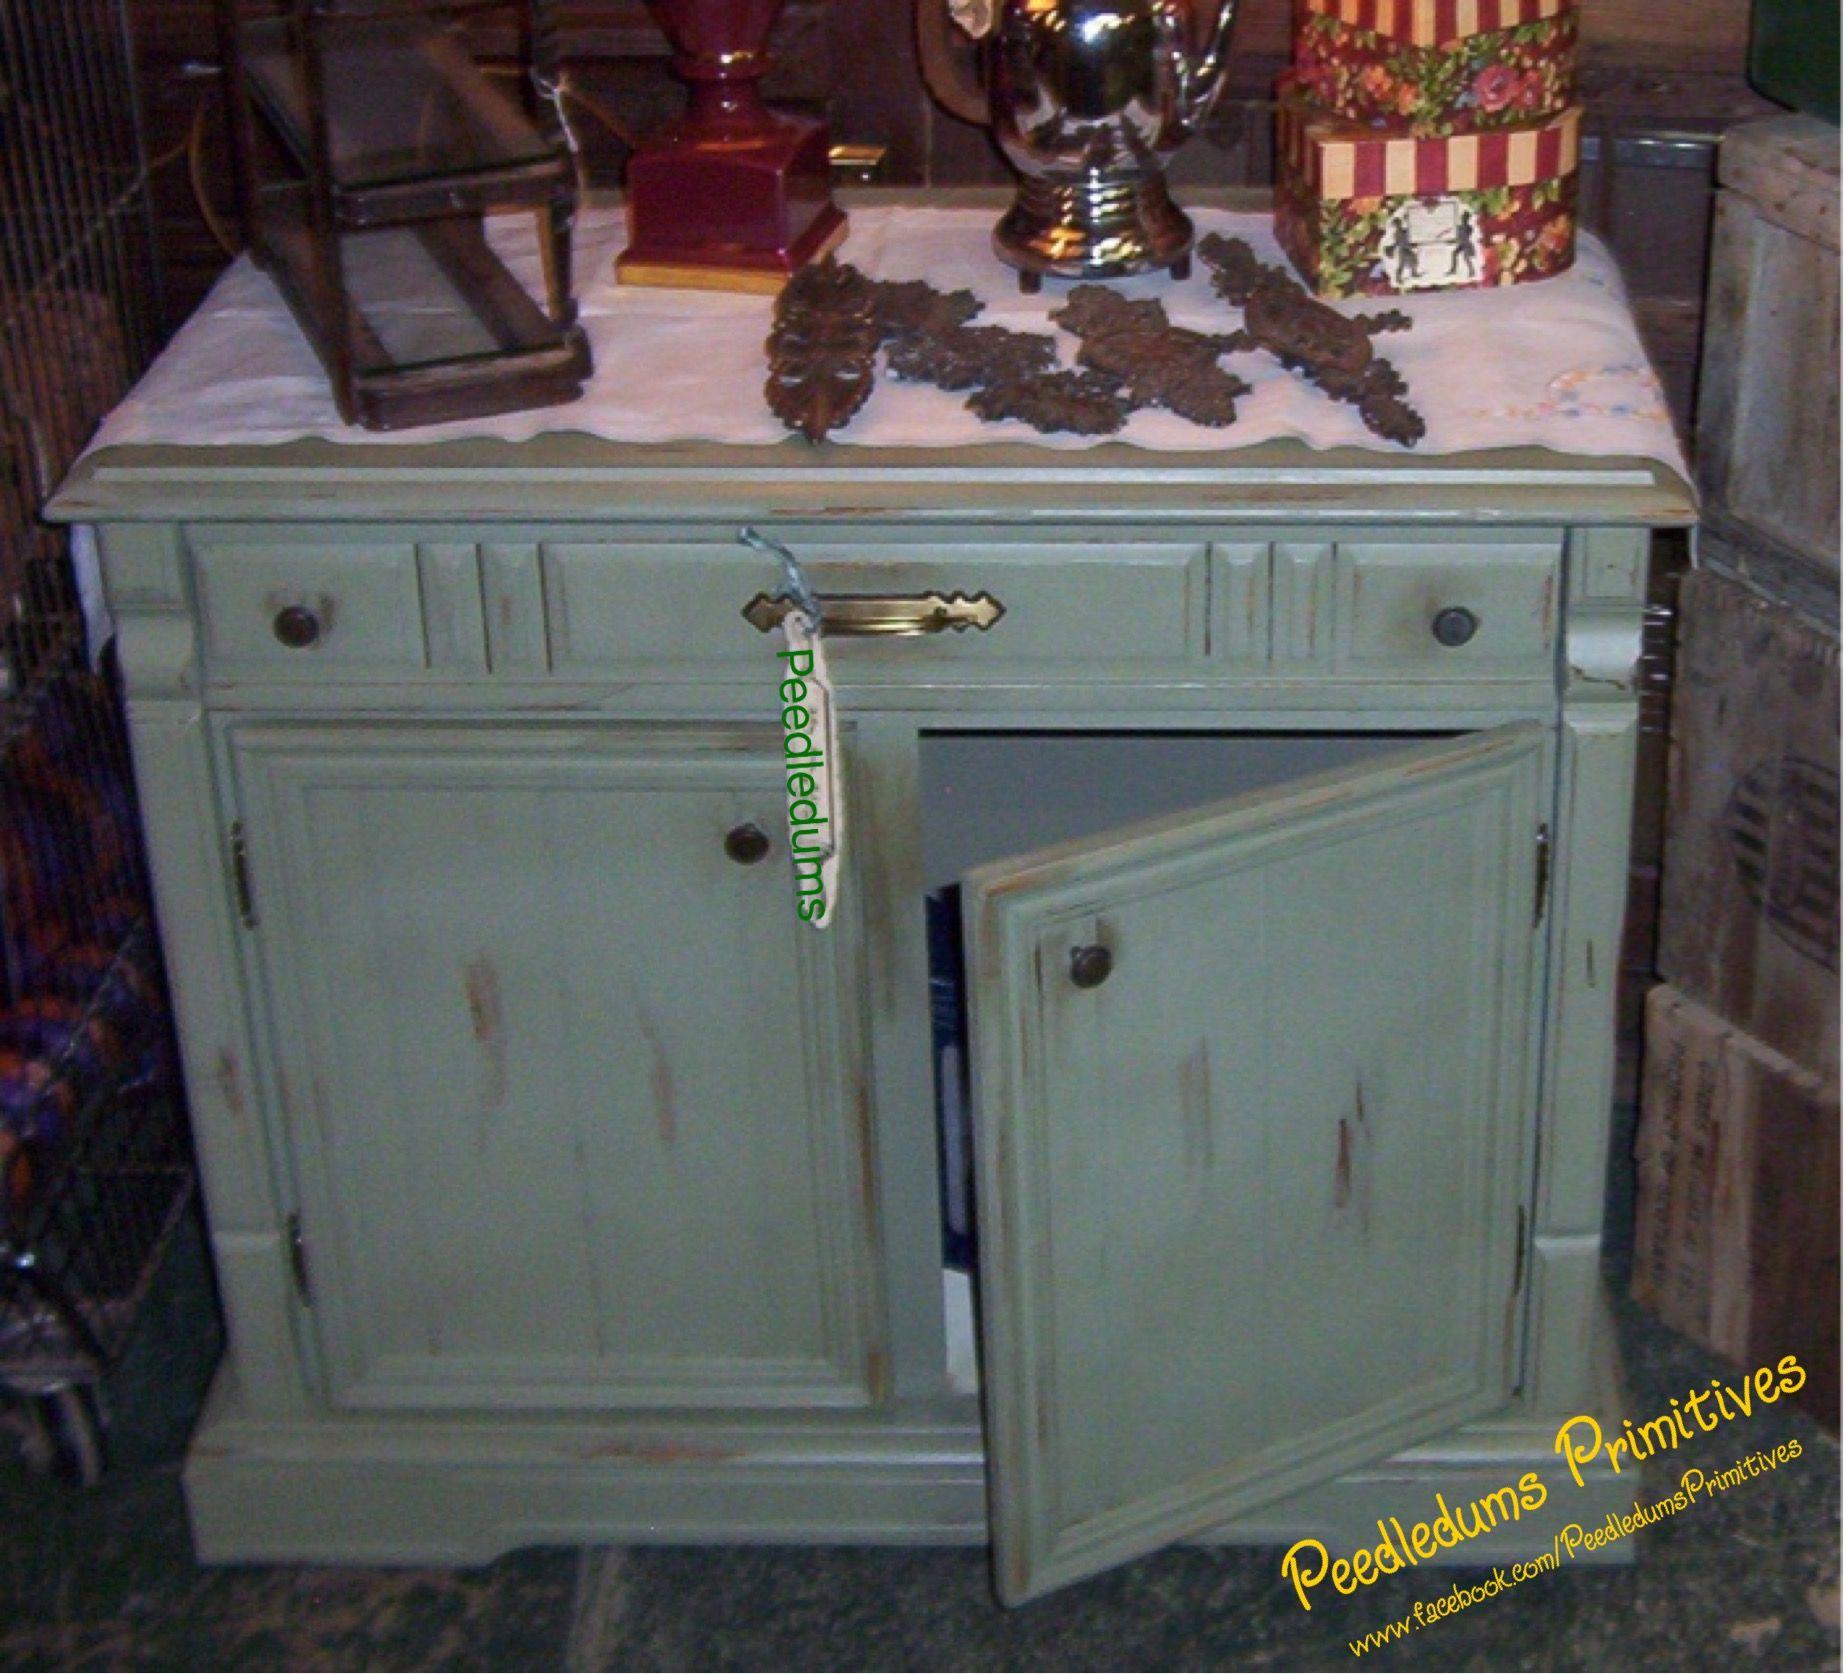 Repurposed console tv cabinet turned kitchen cabinet. | Peedledums ...